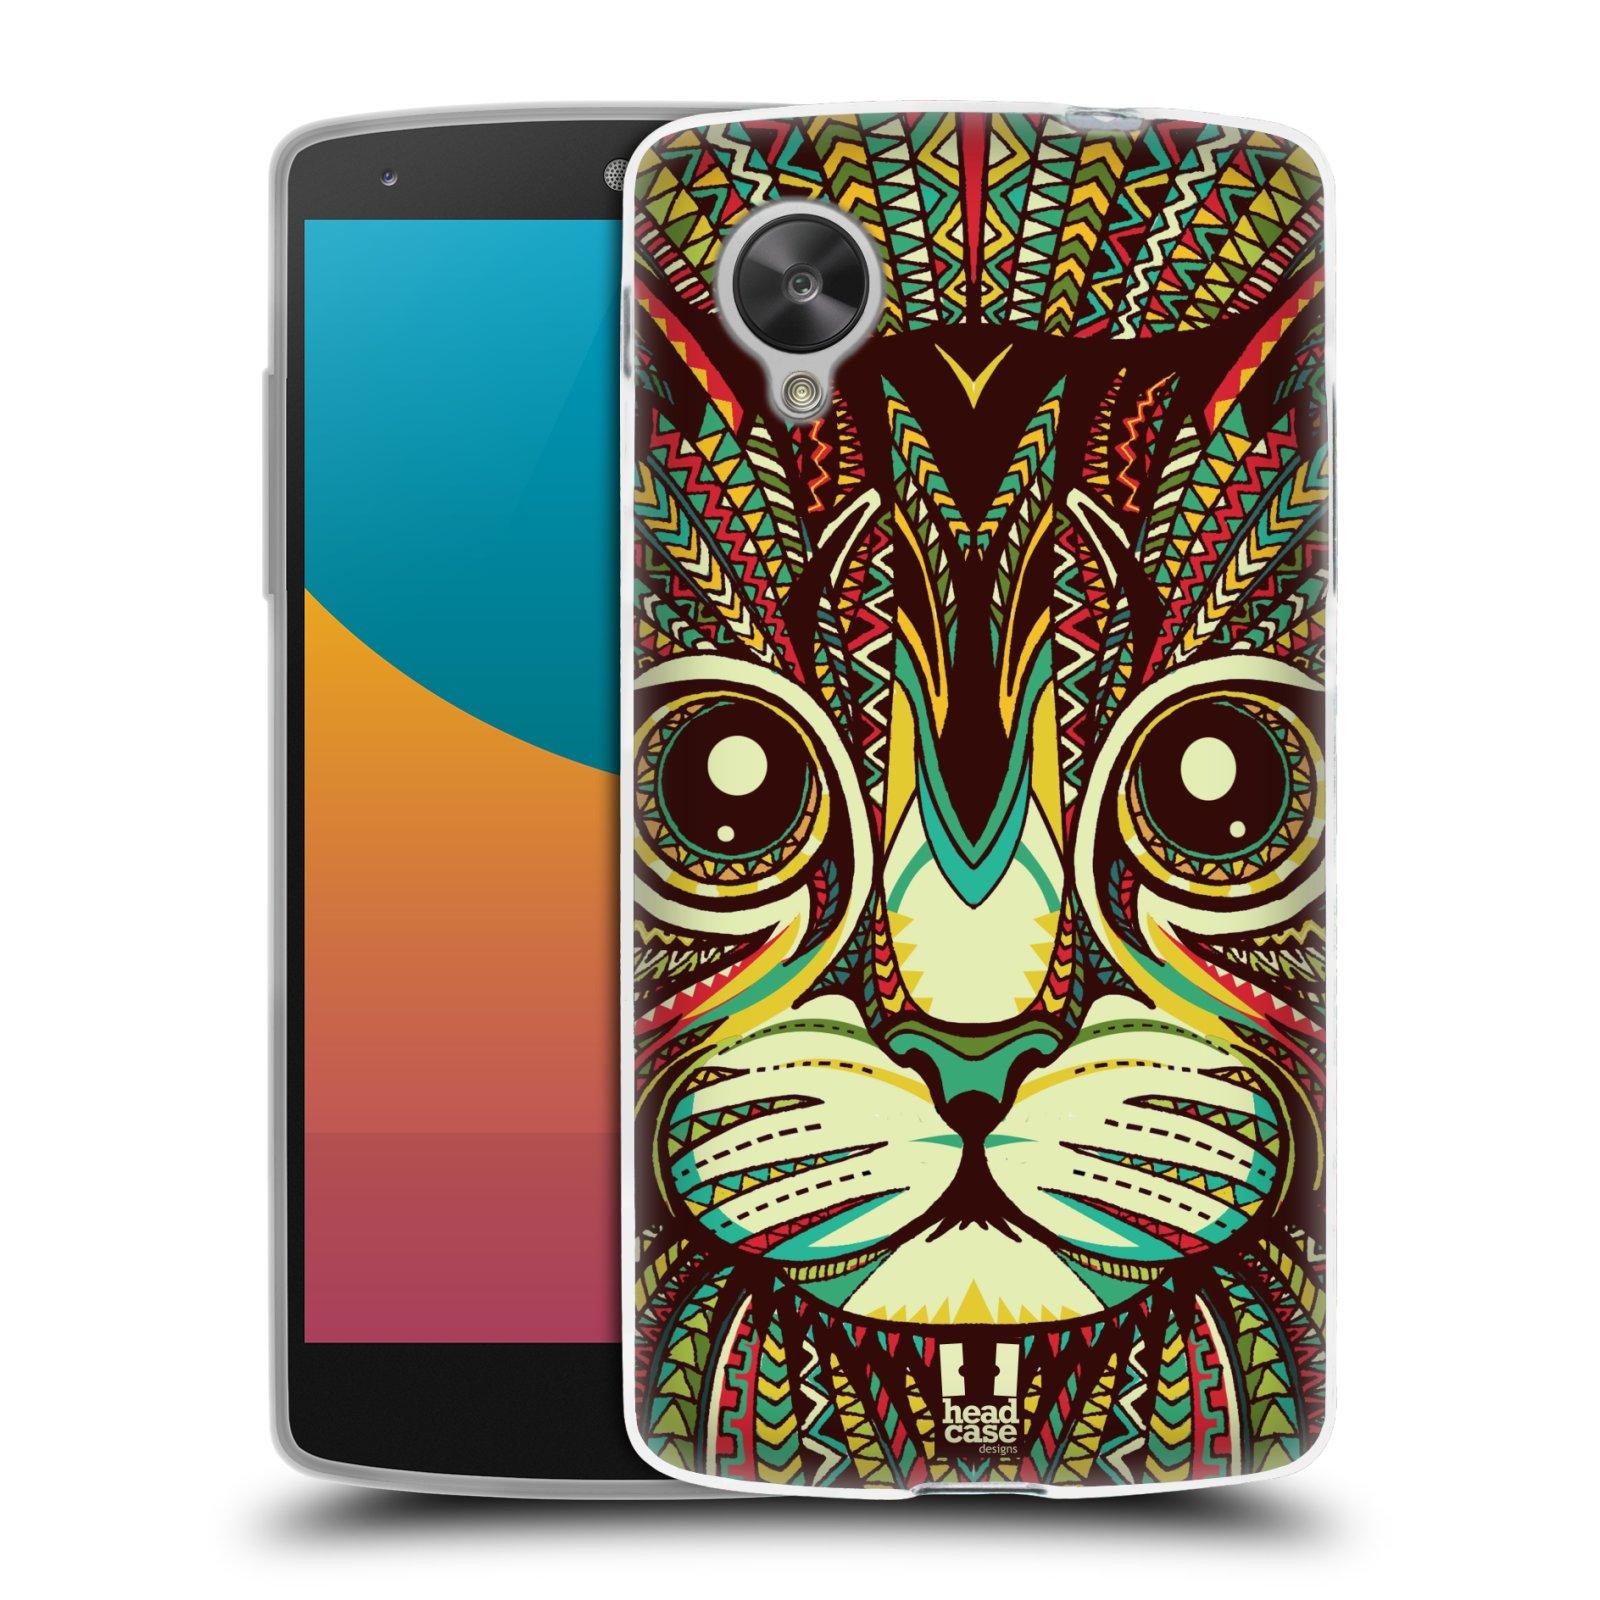 Silikonové pouzdro na mobil LG Nexus 5 HEAD CASE AZTEC KOČKA (Silikonový kryt či obal na mobilní telefon LG Google Nexus 5 D821)